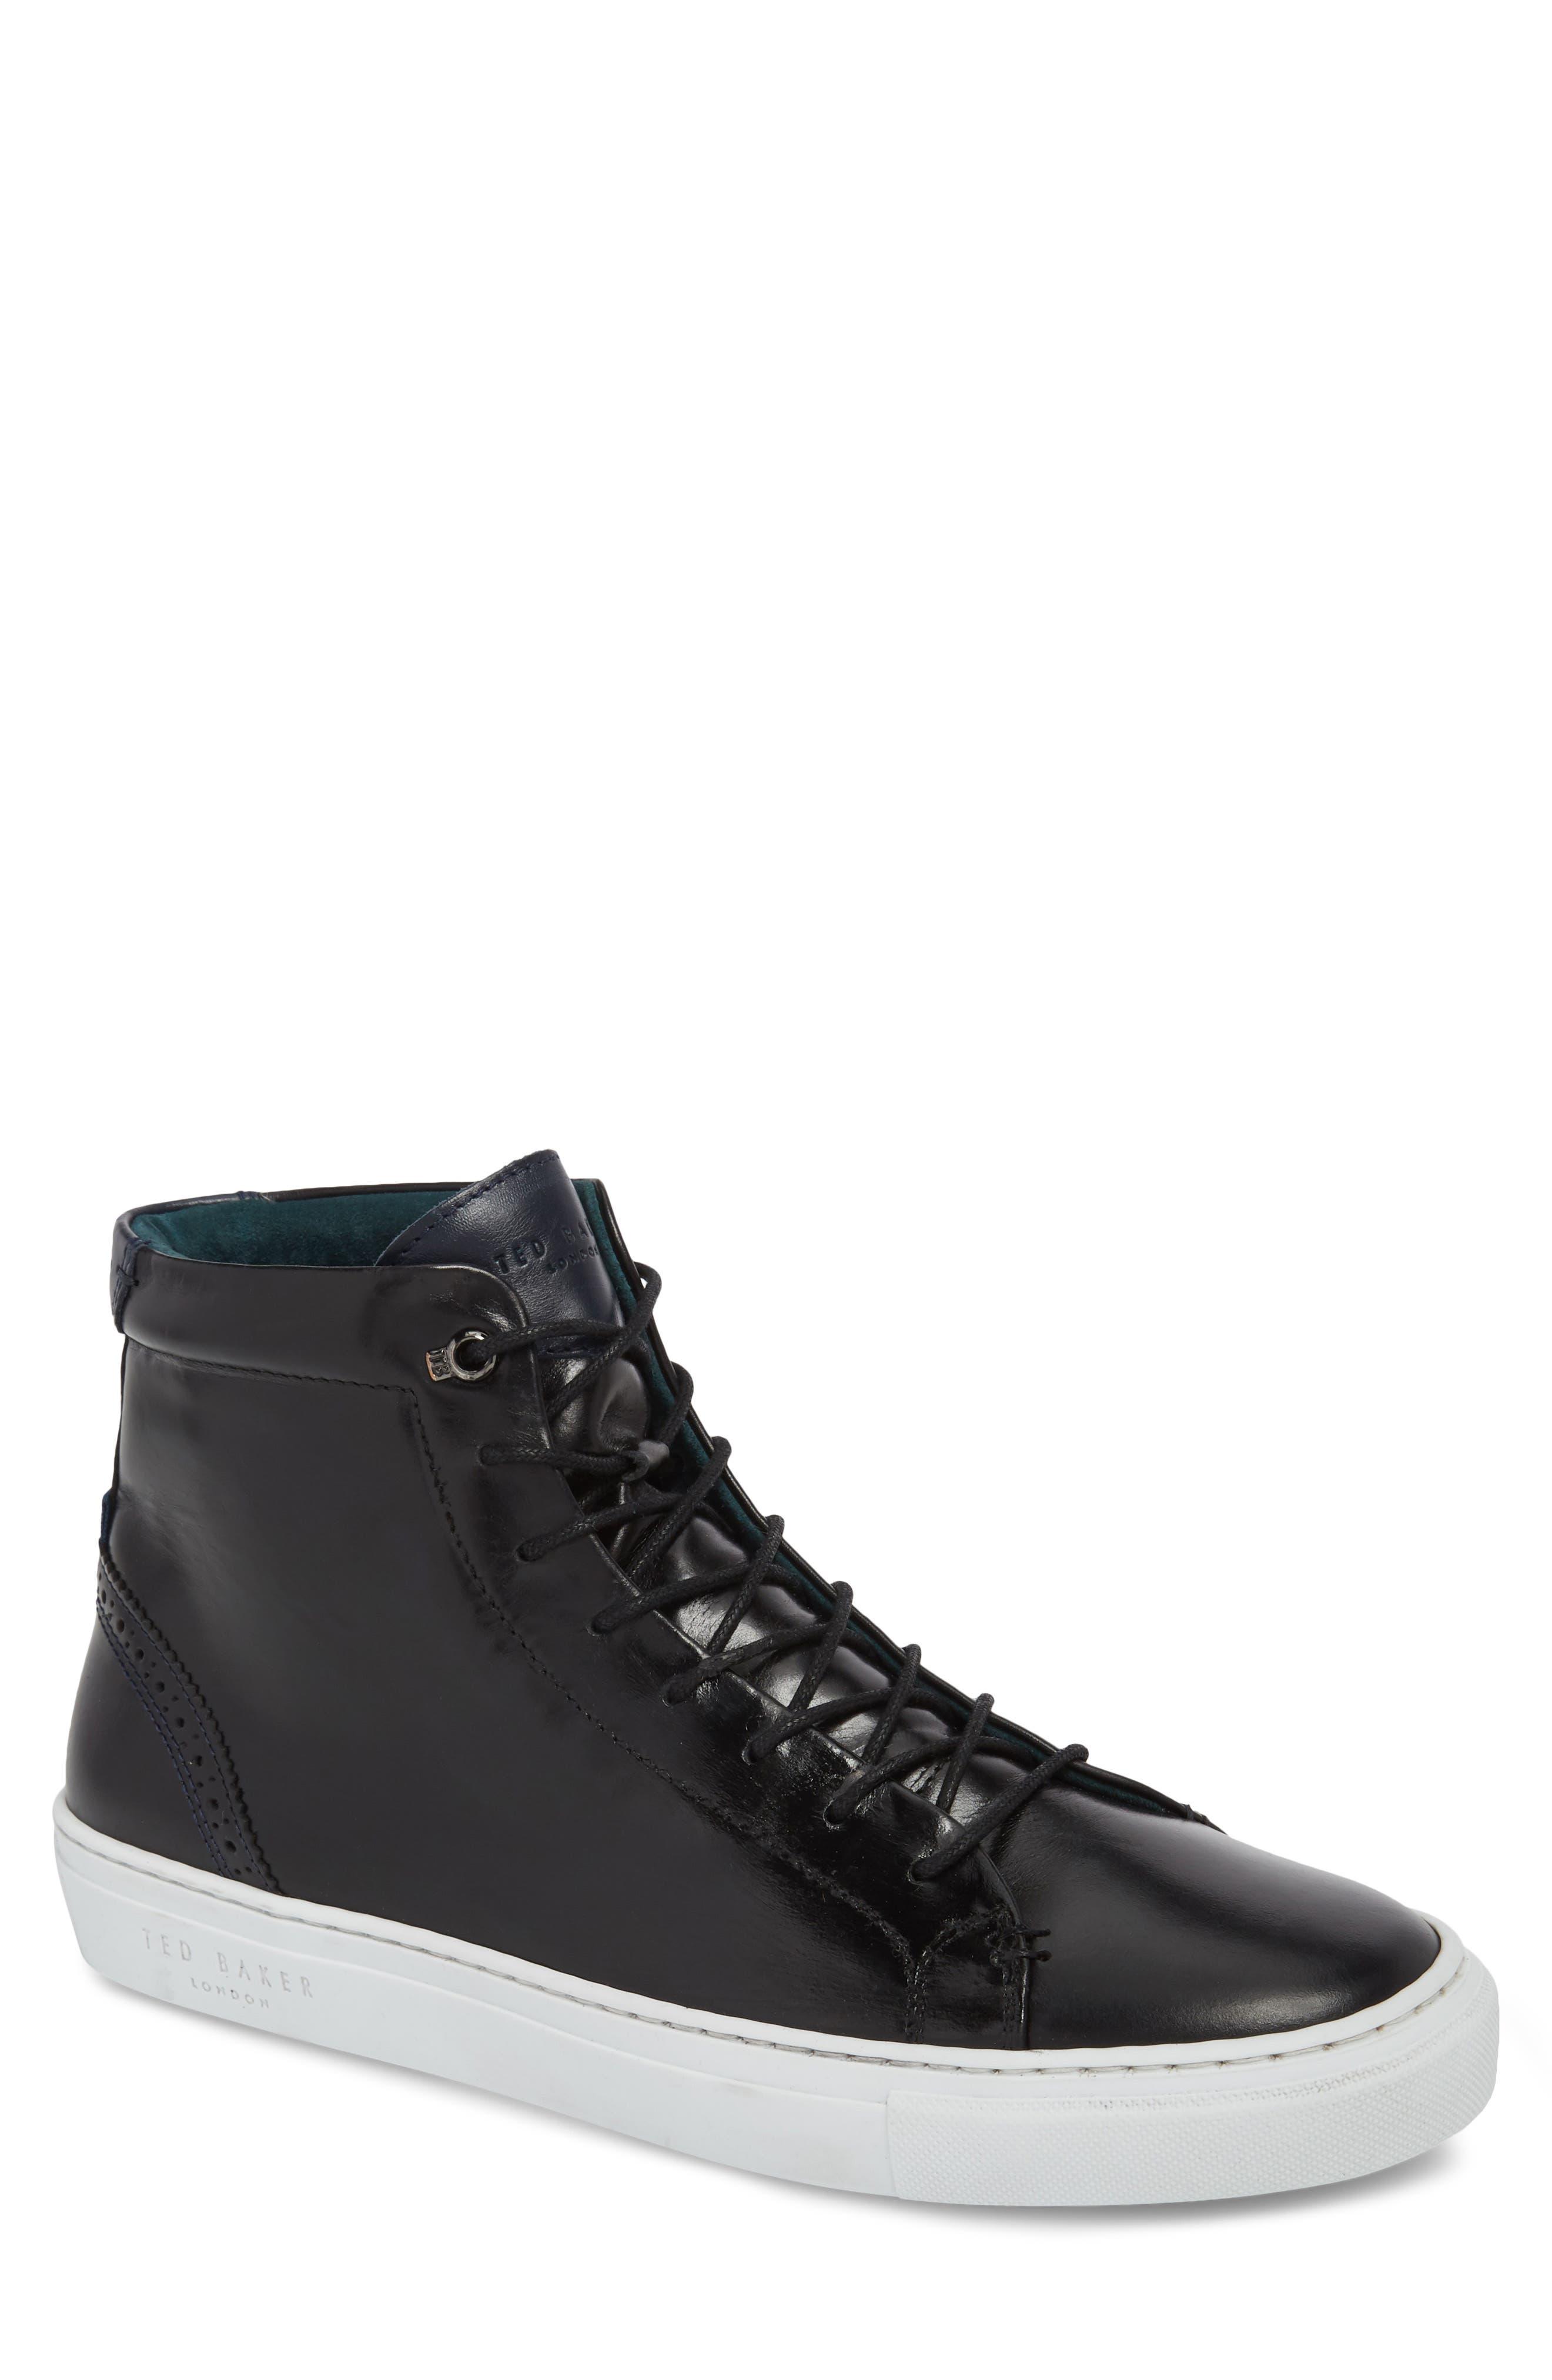 Monerkk High Top Sneaker,                         Main,                         color, Black Leather